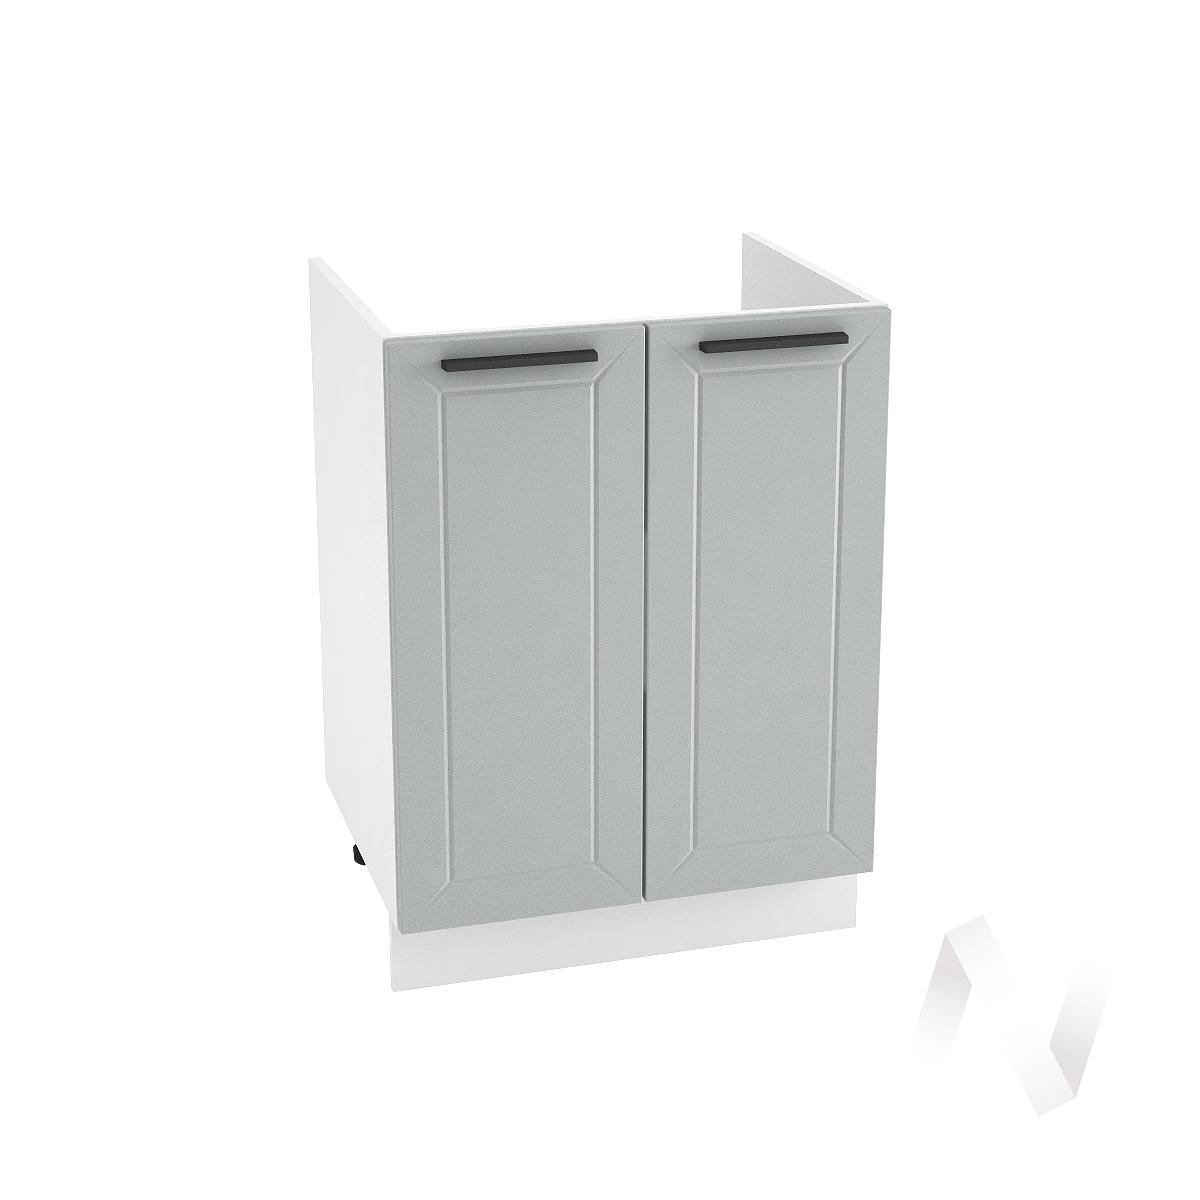 "Кухня ""Глетчер"": Шкаф нижний под мойку 600, ШНМ 600 (Гейнсборо Силк/корпус белый)"